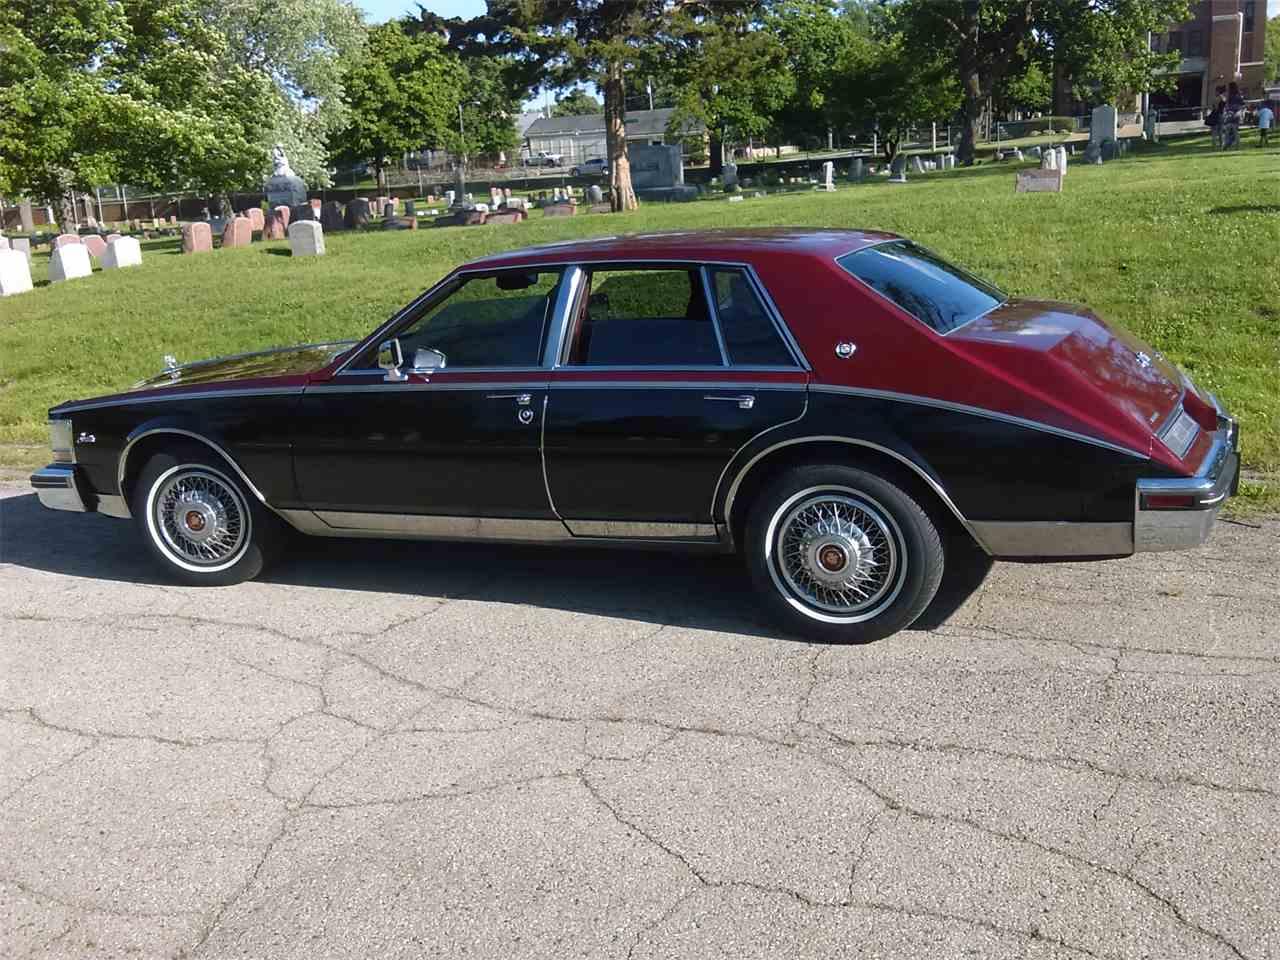 1985 Cadillac Seville for Sale | ClassicCars.com | CC-1024216 | 1280 x 960 jpeg 138kB